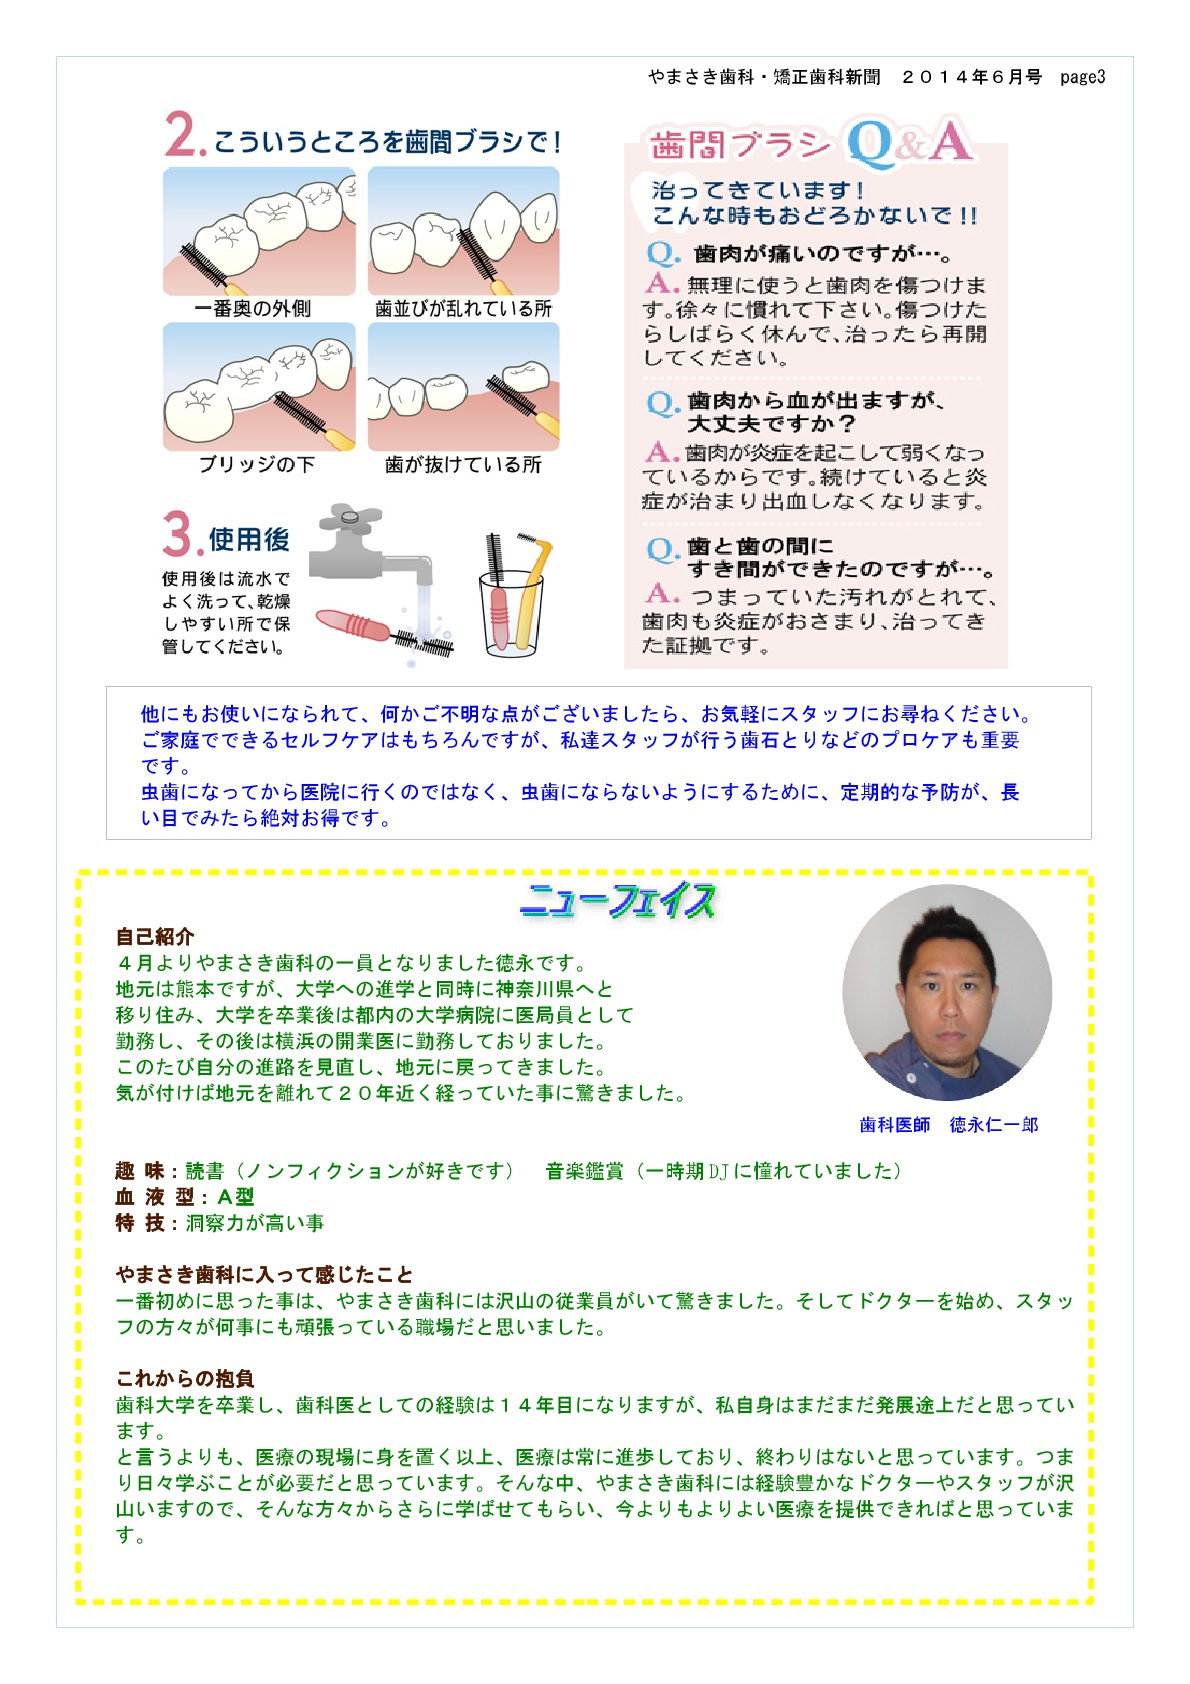 sinbun14-6-2-002